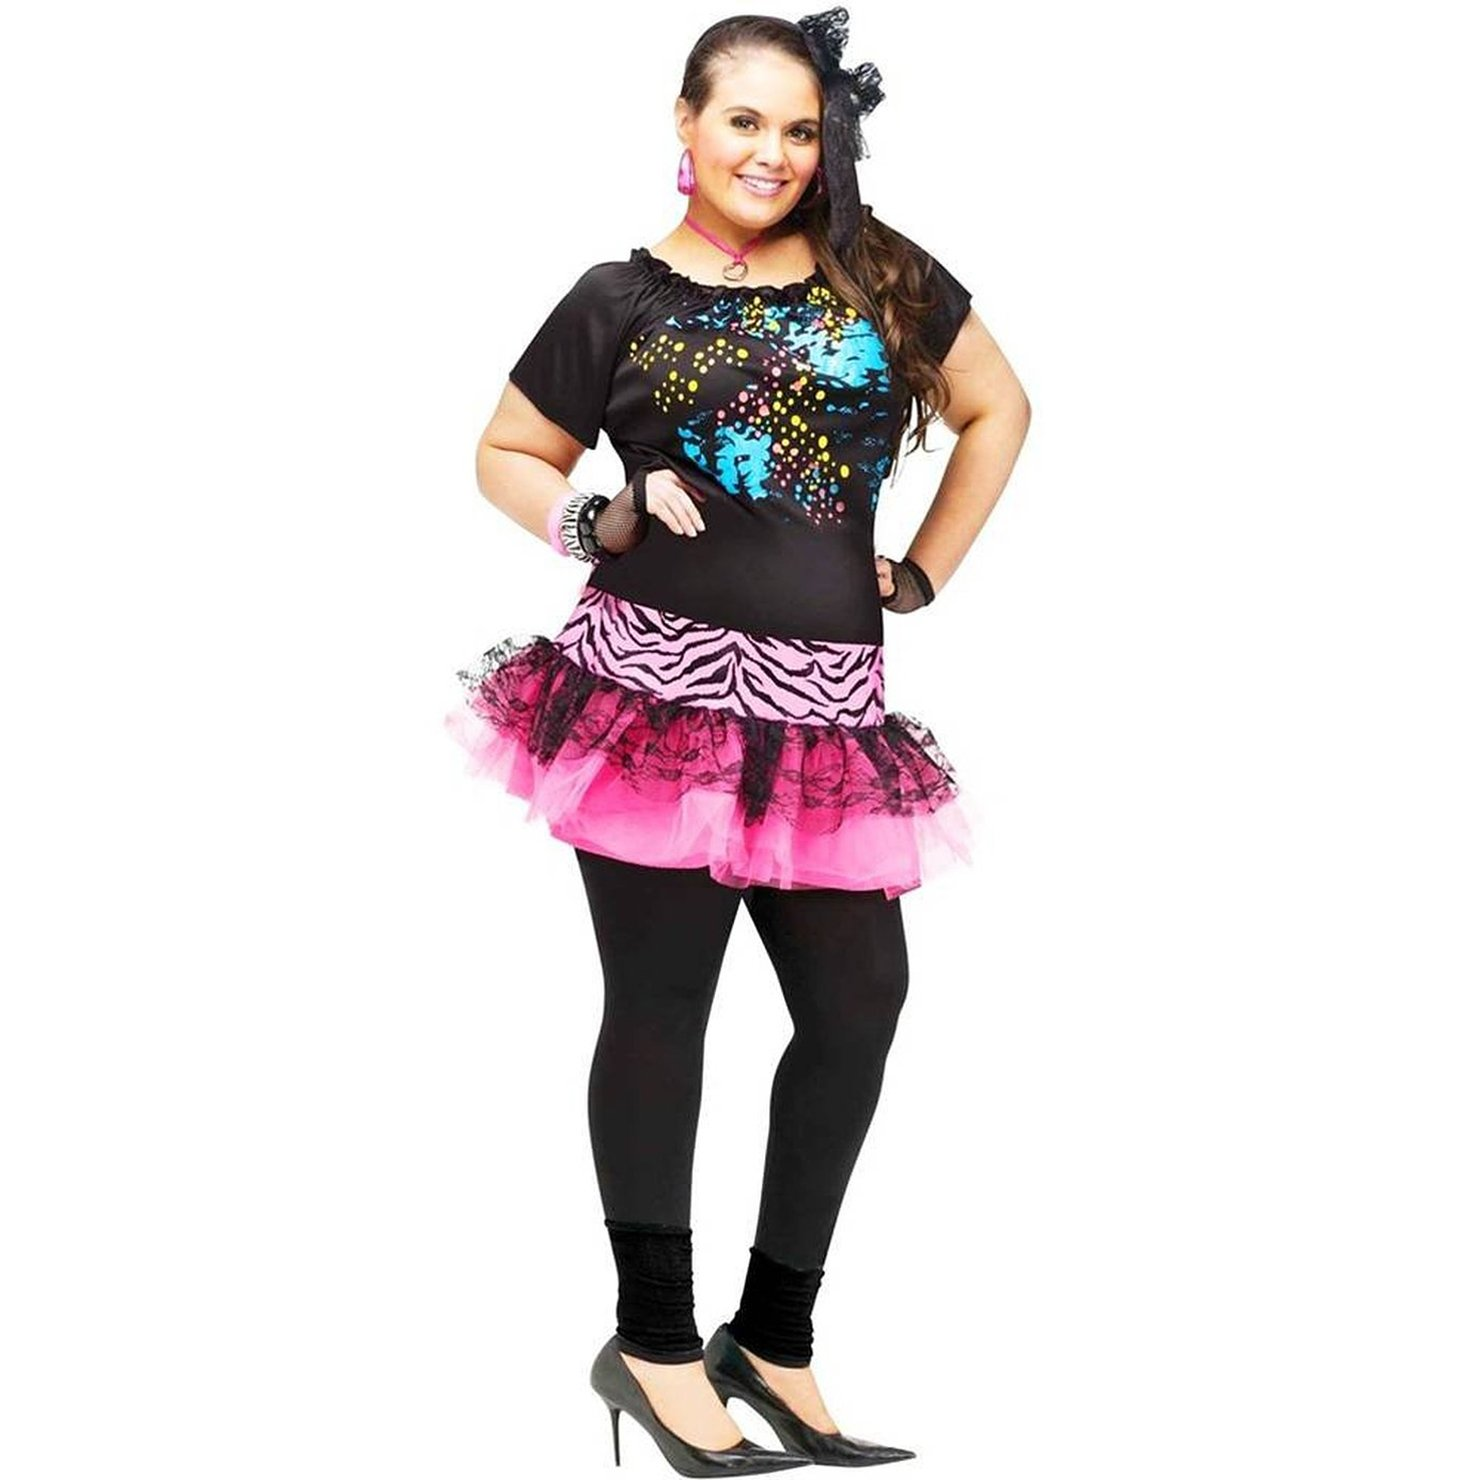 c8c6fa92327 Amazon.com: Fun World Plus Size Womens 80s Pop Party Colorful Dress  Accessory: Clothing